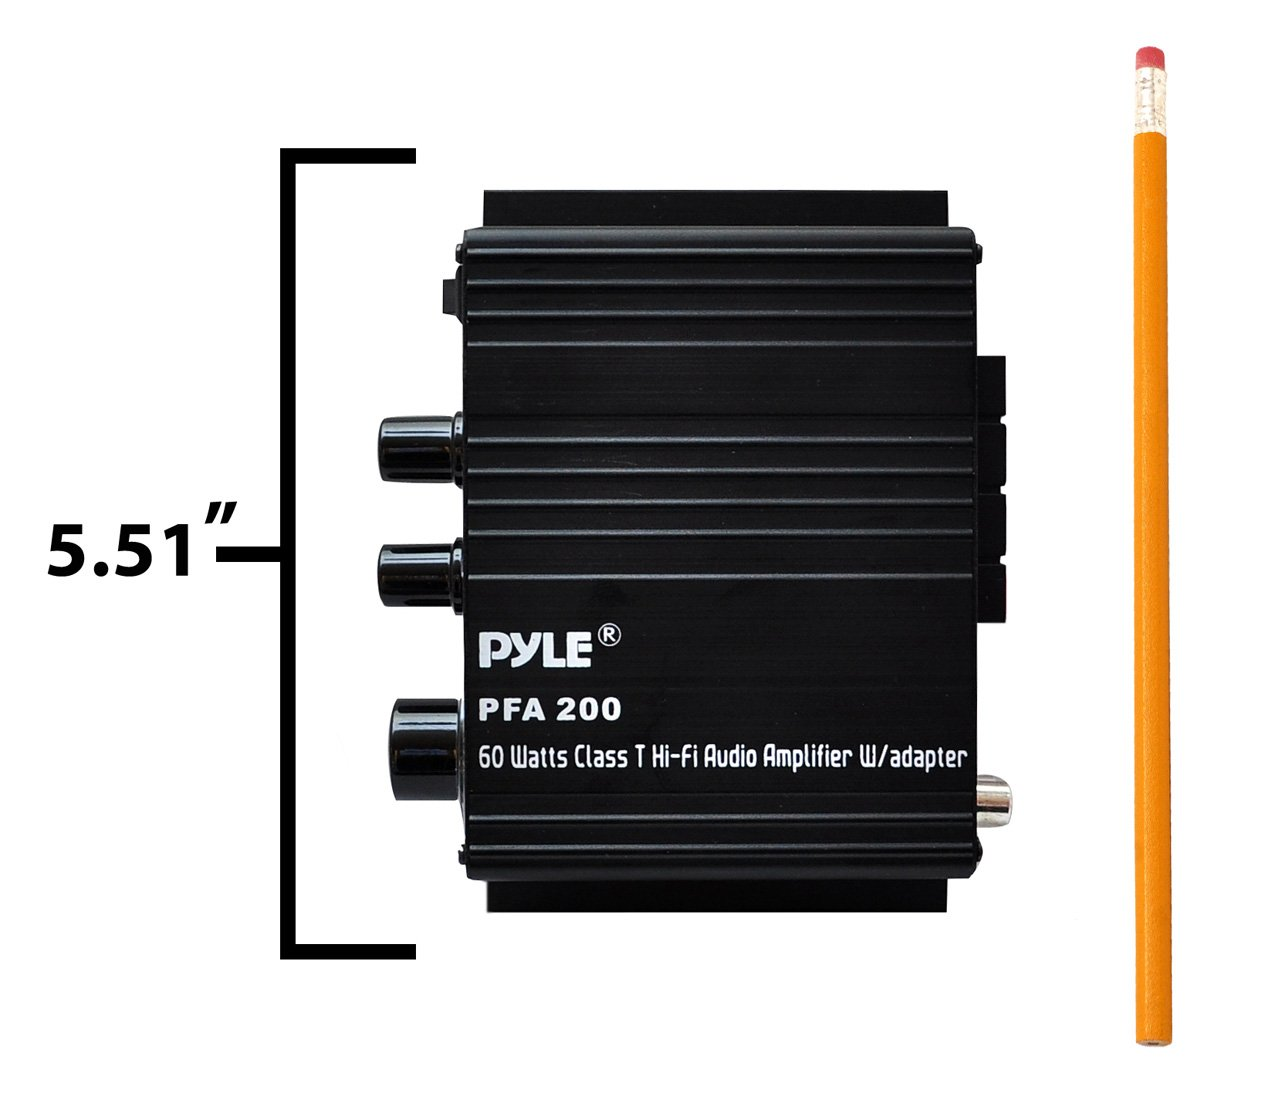 Pyle Home Mini Audio Amplifier 60w Portable Dual Uniton 50 60 Watt Head Wiring Diagram Channel Surround Sound Hifi Stereo Receiver W 12v Ac Adapter Aux Mic In Supports Smart